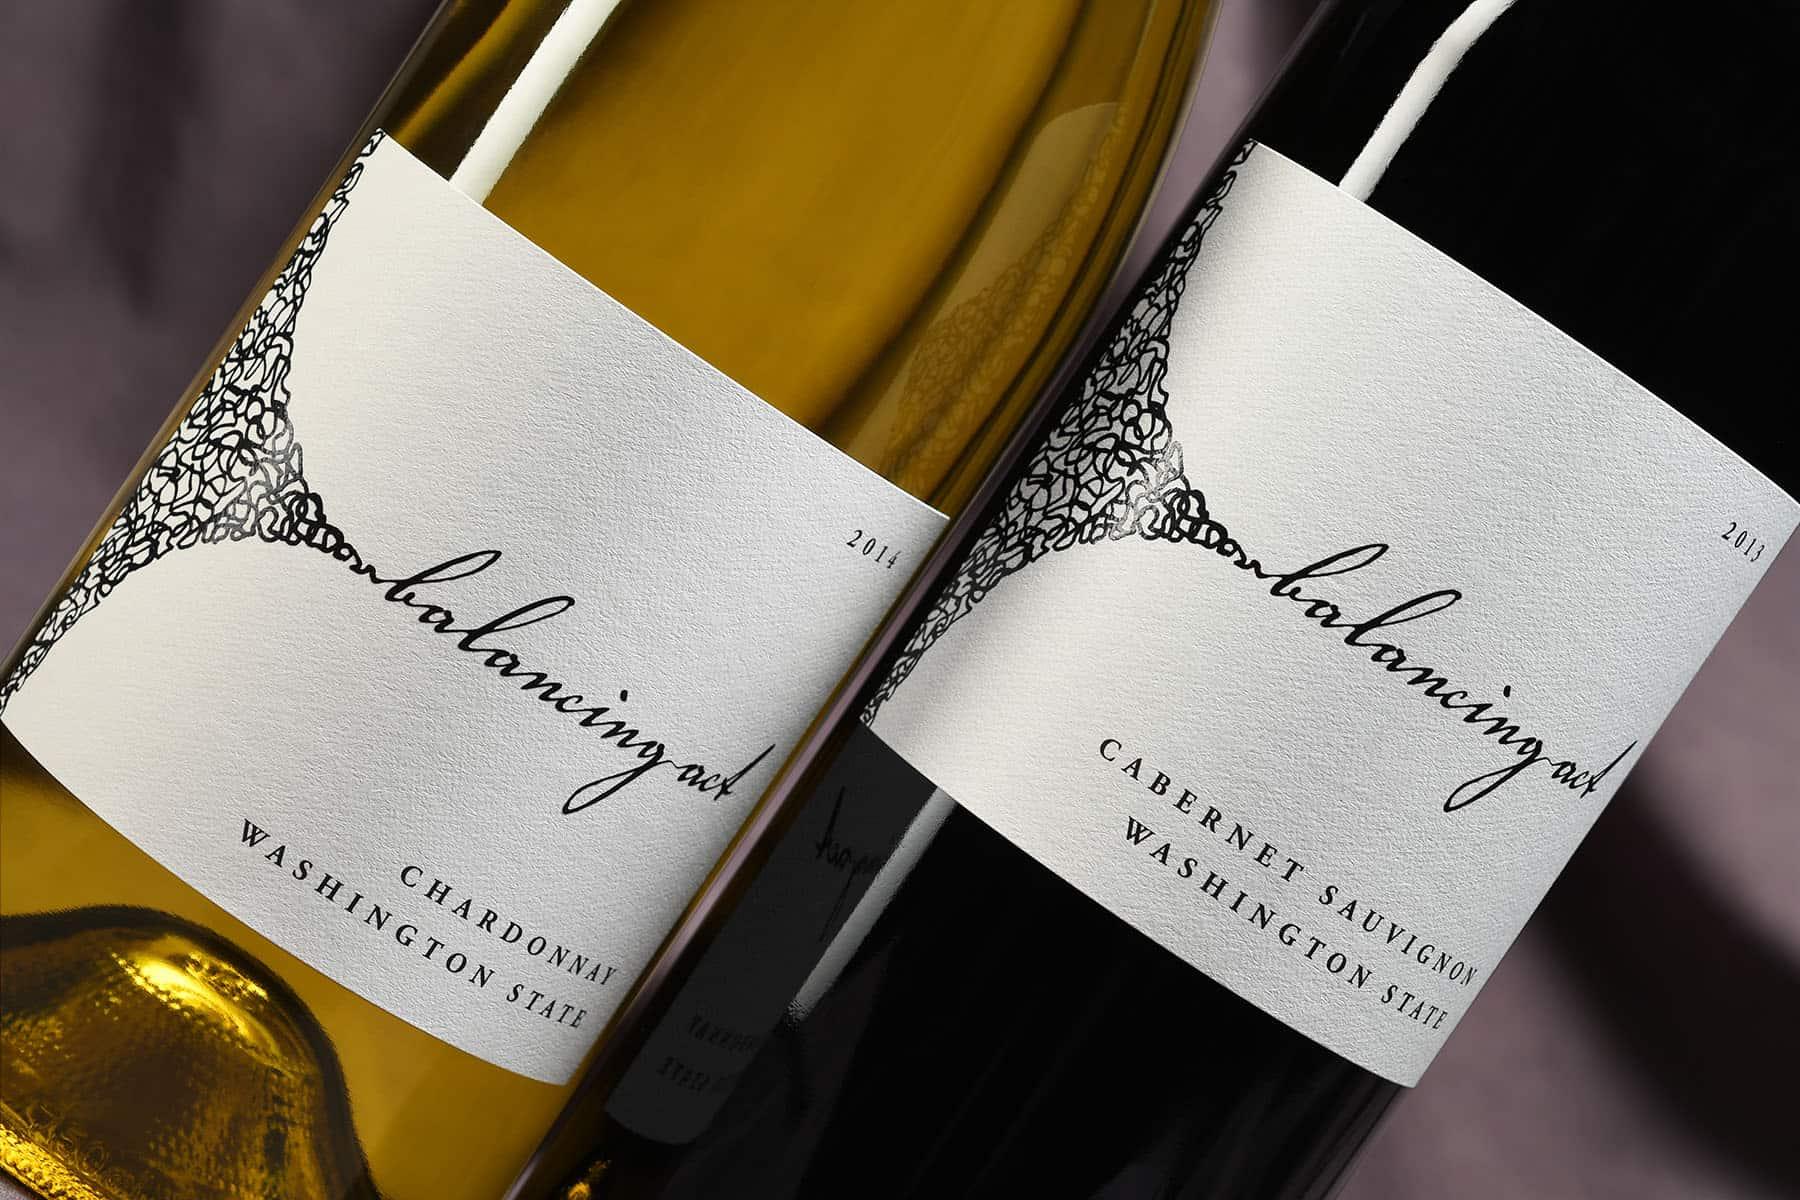 Balancing Act wine bottles close up